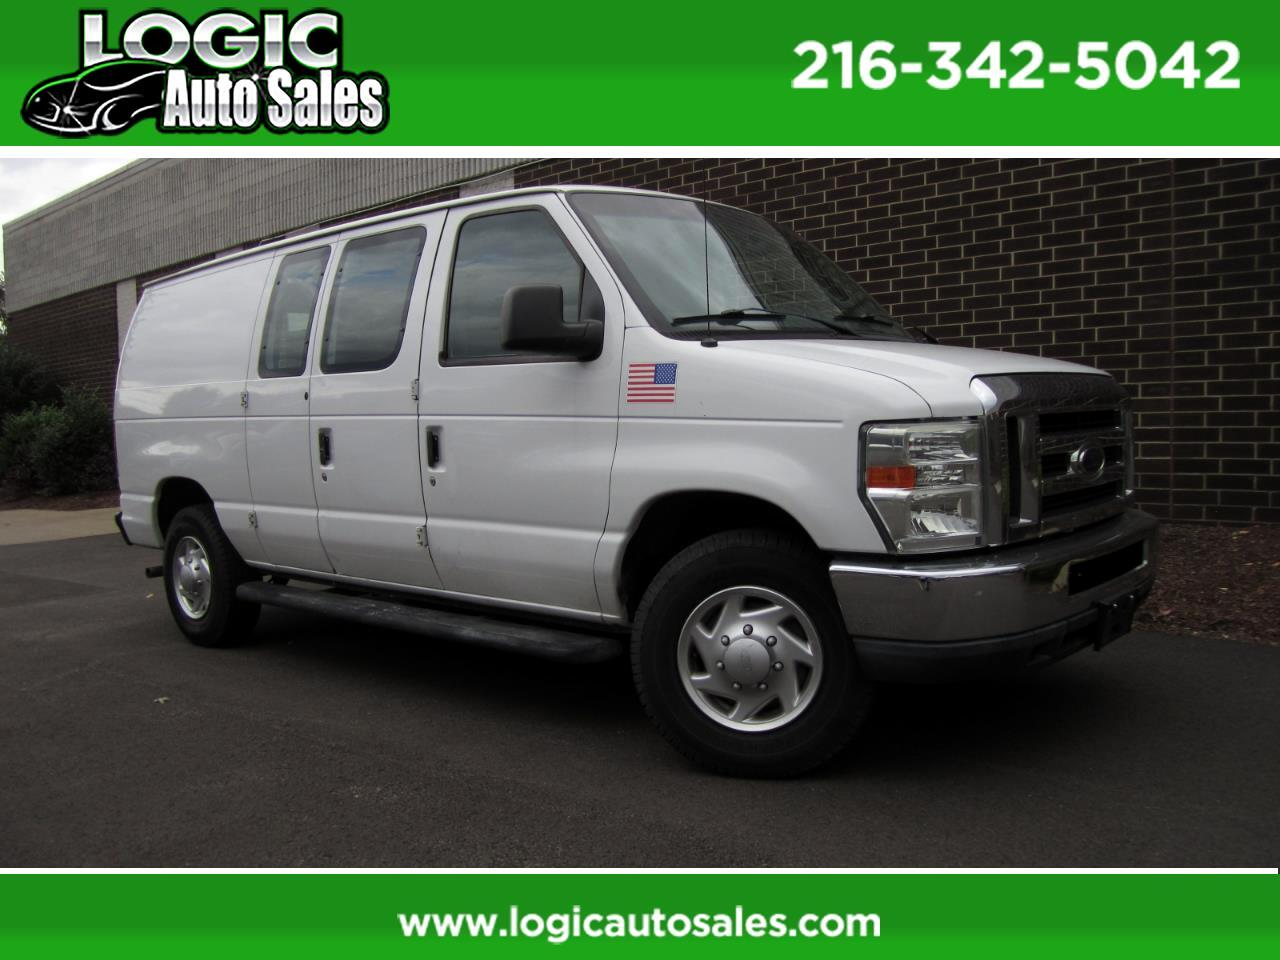 Ford Econoline Cargo Van E-250 Commercial 2010